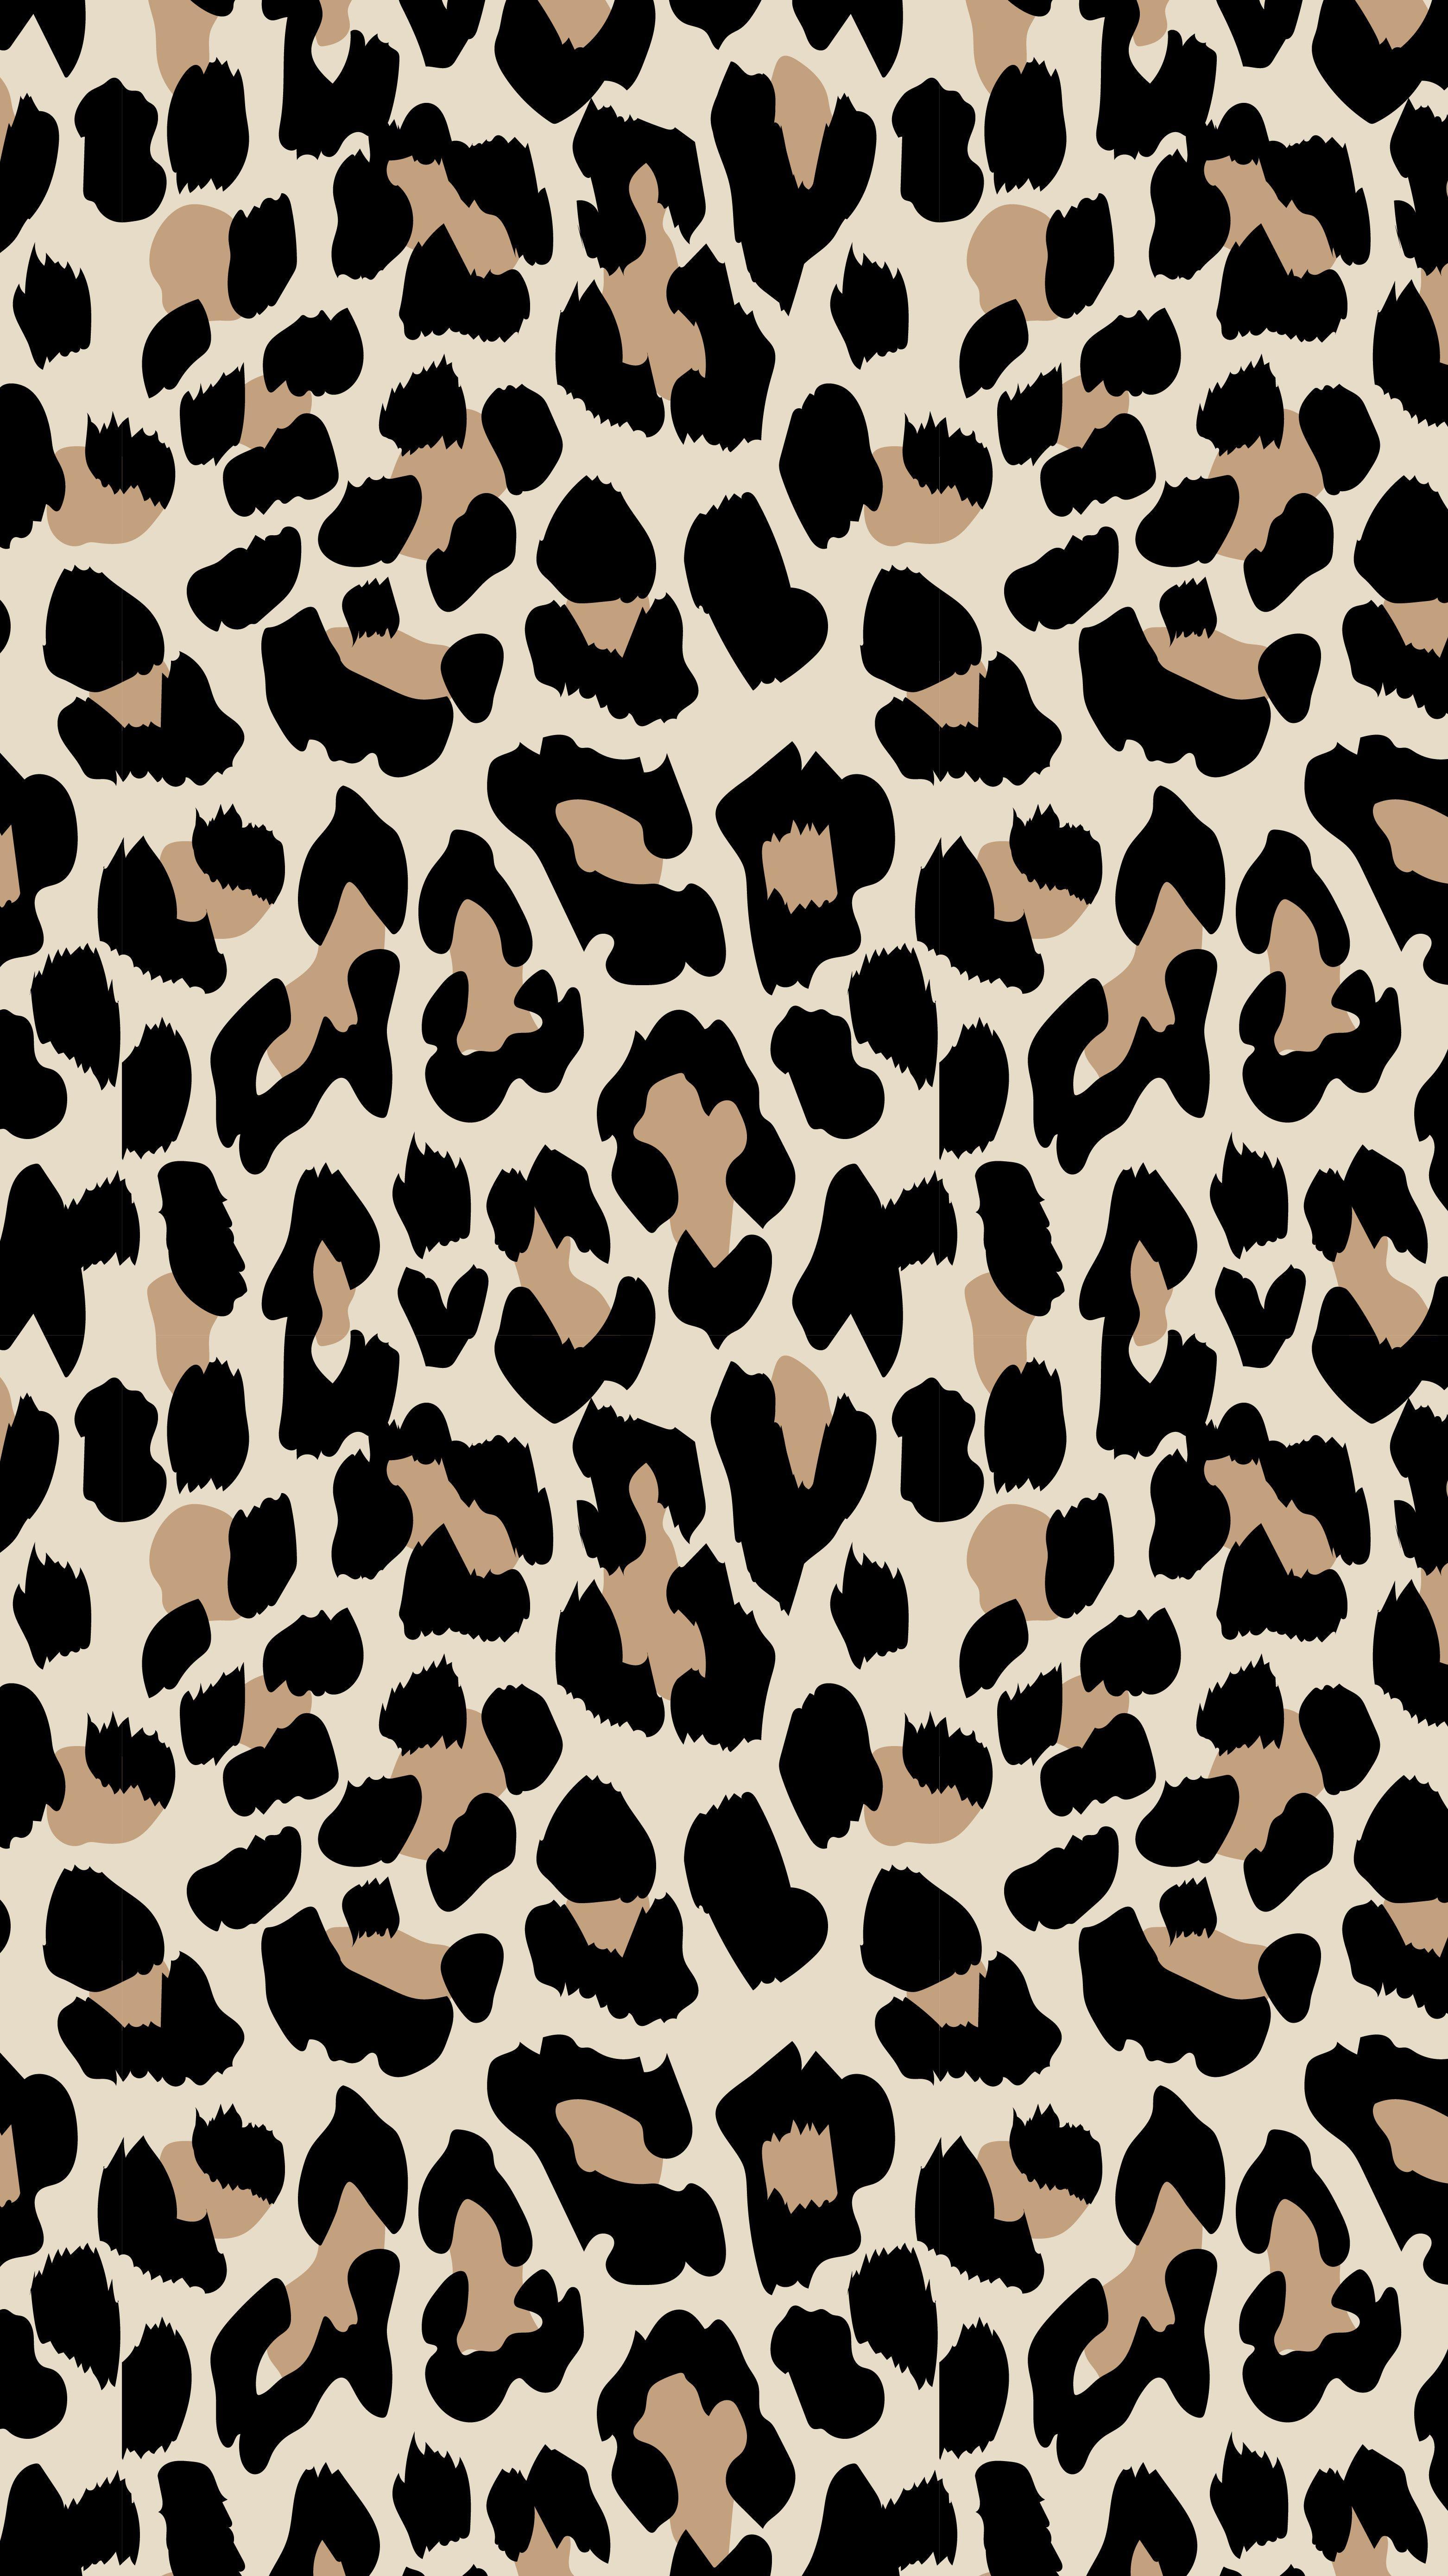 Cheetah Print Wallpapers - Top Free Cheetah Print ...